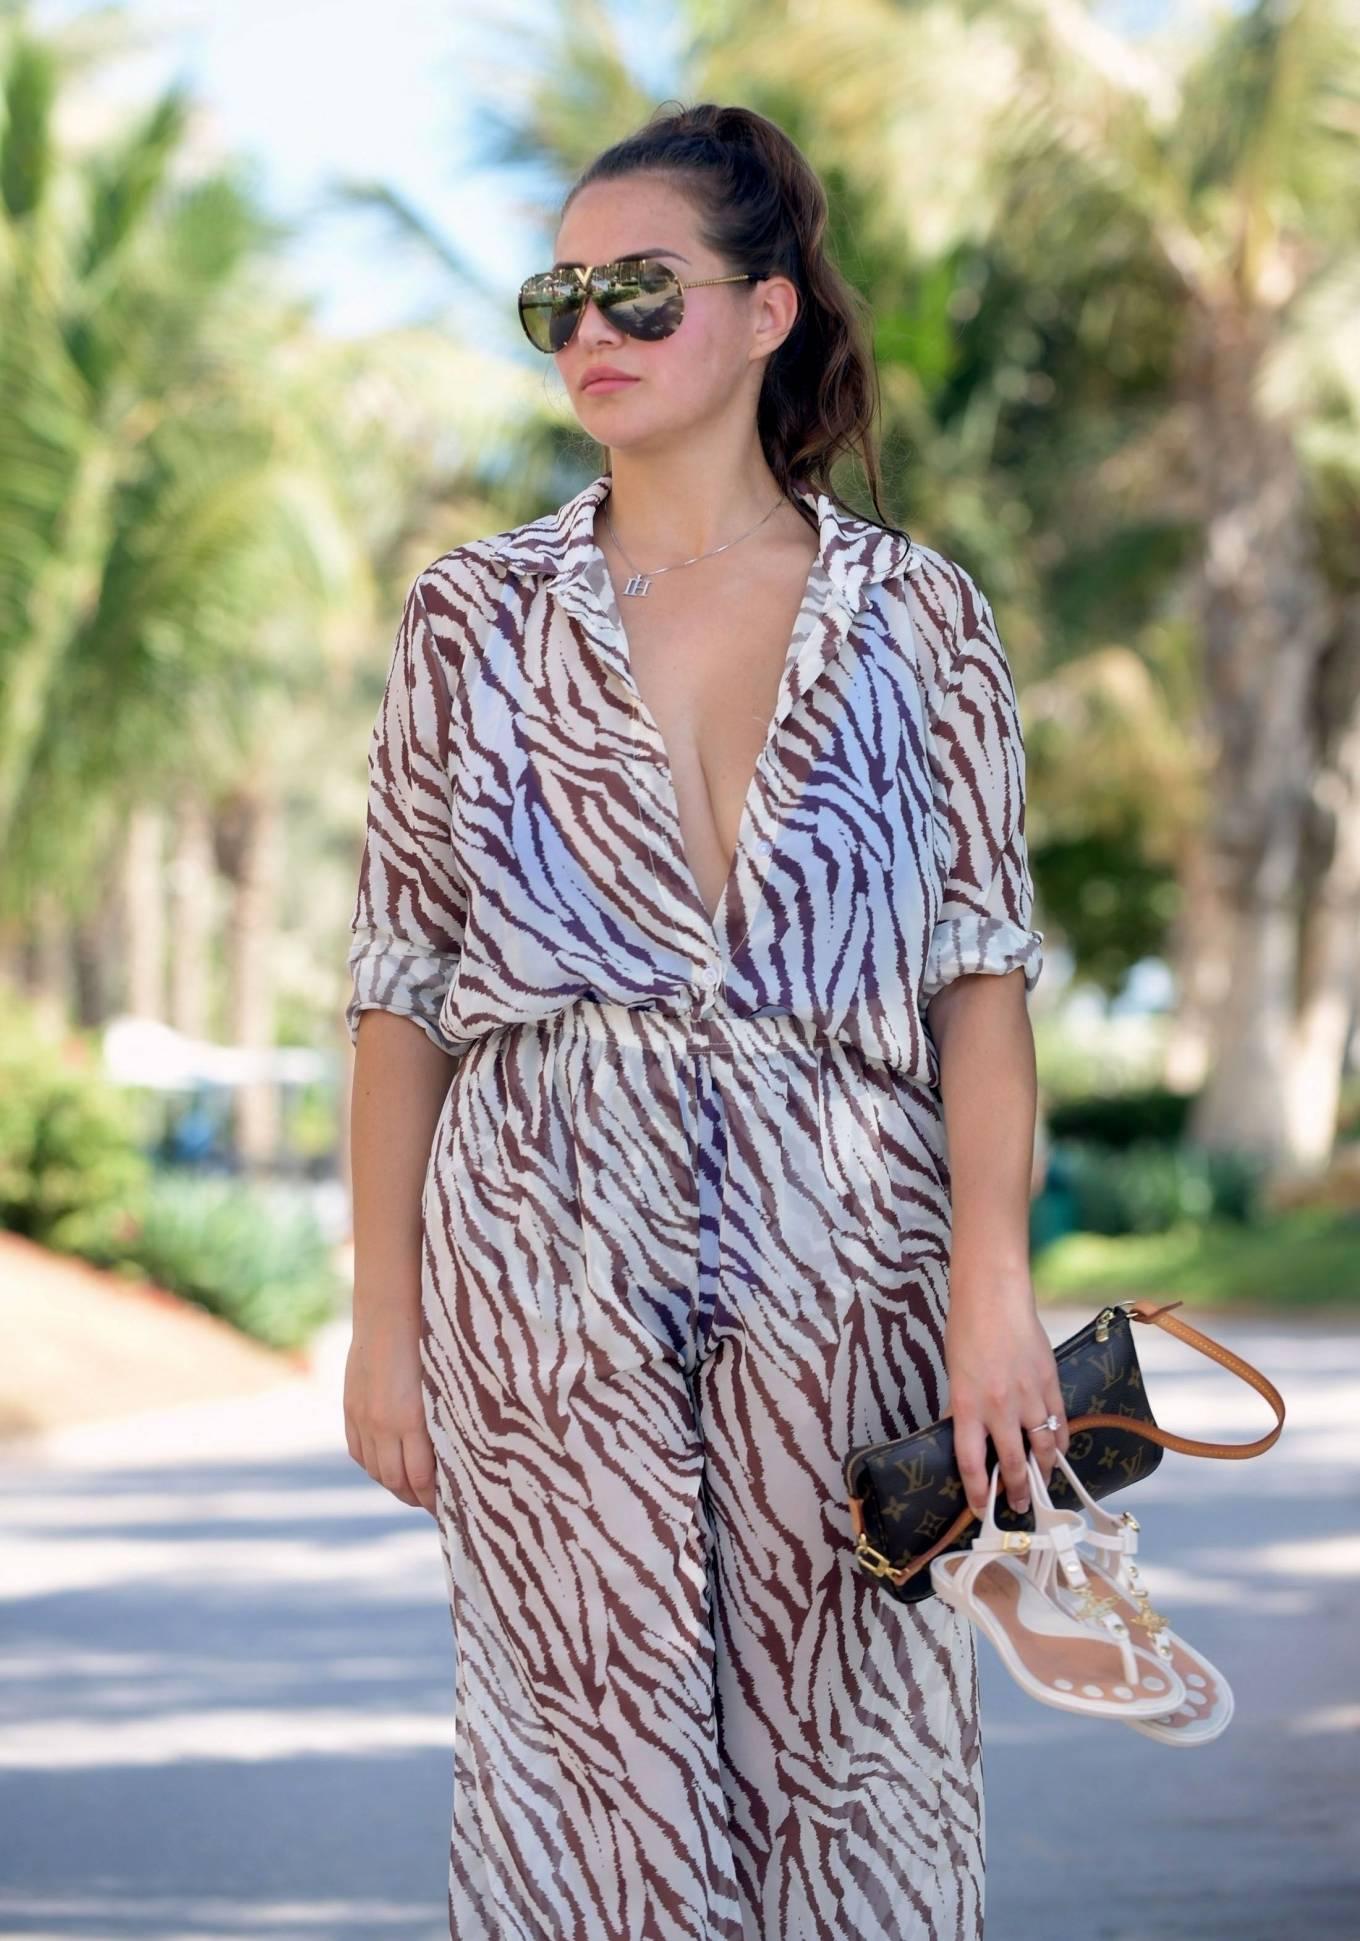 Chloe Goodman 2020 : Chloe Goodman – In a zebra print jumpsuit out on holiday in Dubai-22